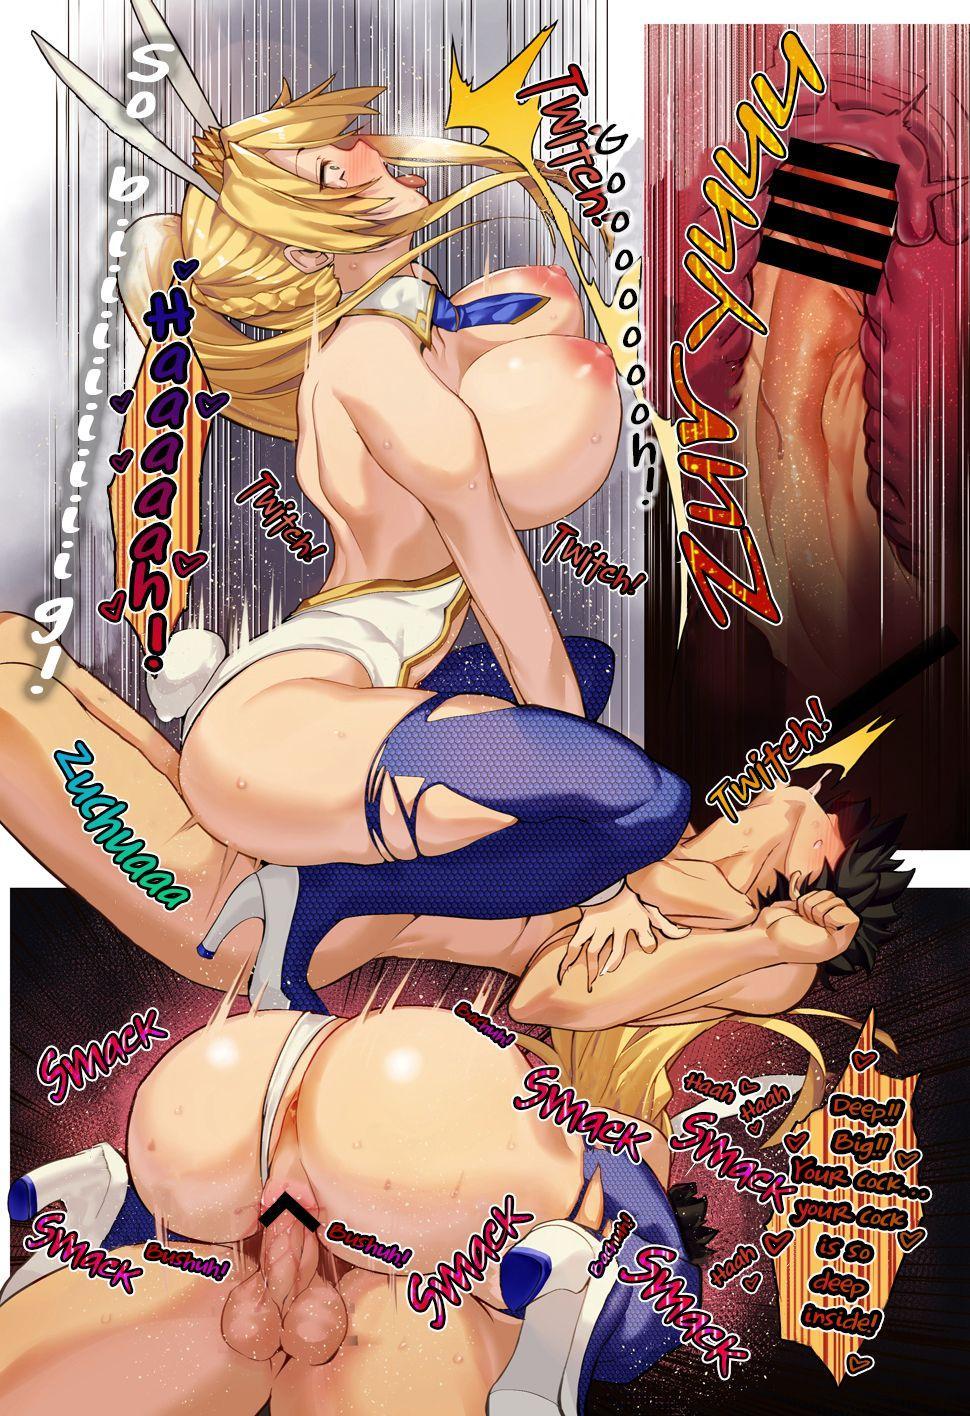 Kinpatsu Bunny to H na Game Shimasu + Omakebon | Playing a Naughty Game With a Blond Bunny + Special 7